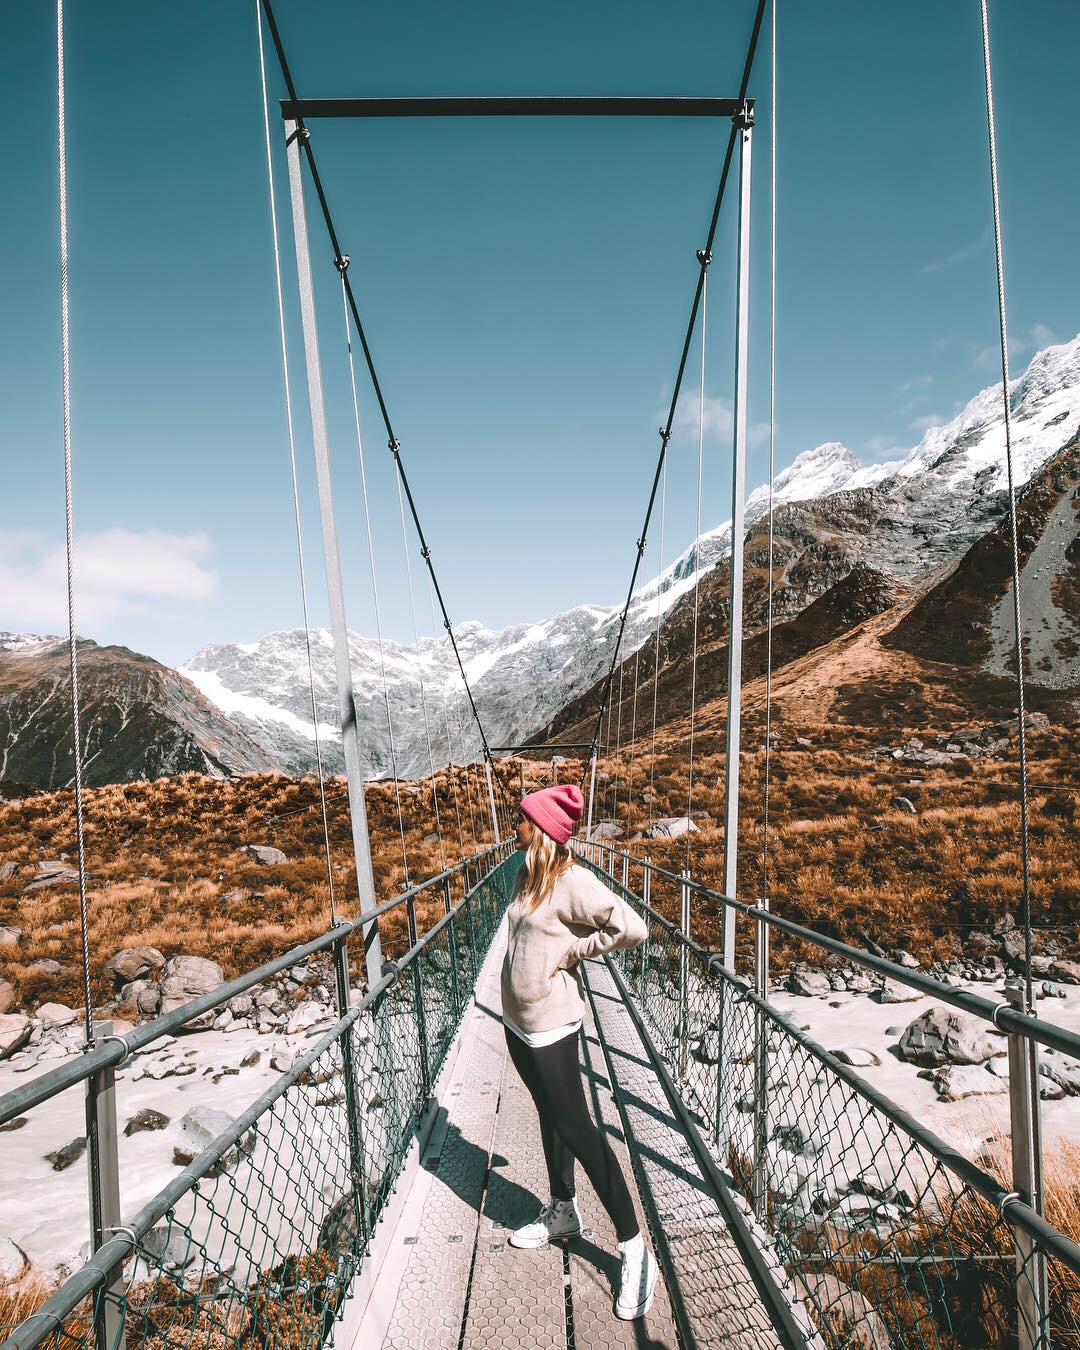 Mont Cook Nouvelle-Zélande - Blondie Baby blog voyages et mode